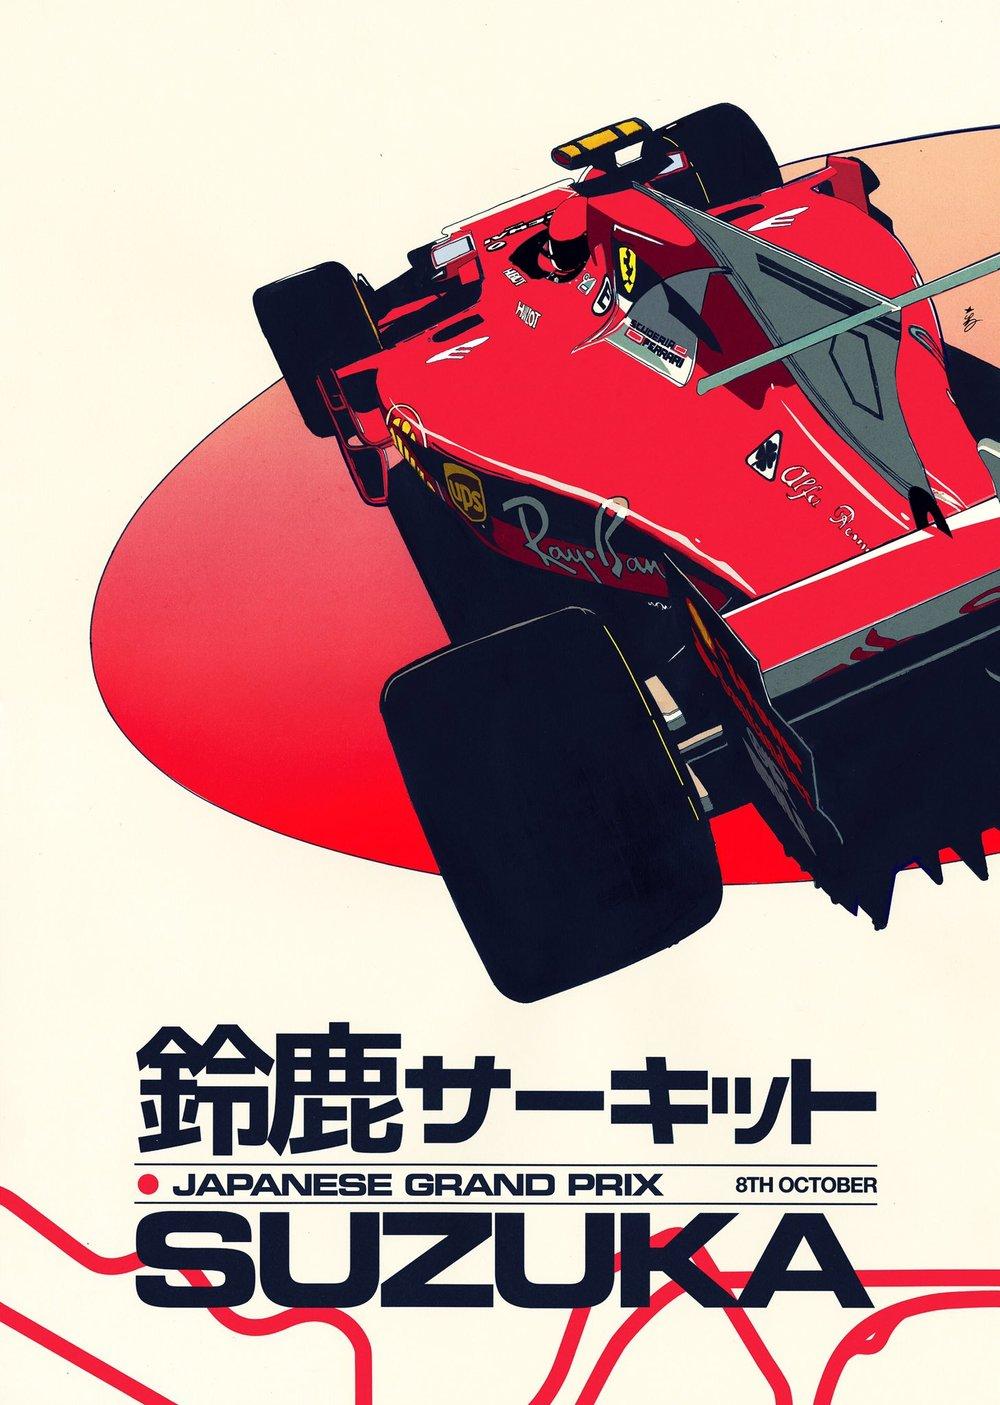 2017 Japanese Grand Prix